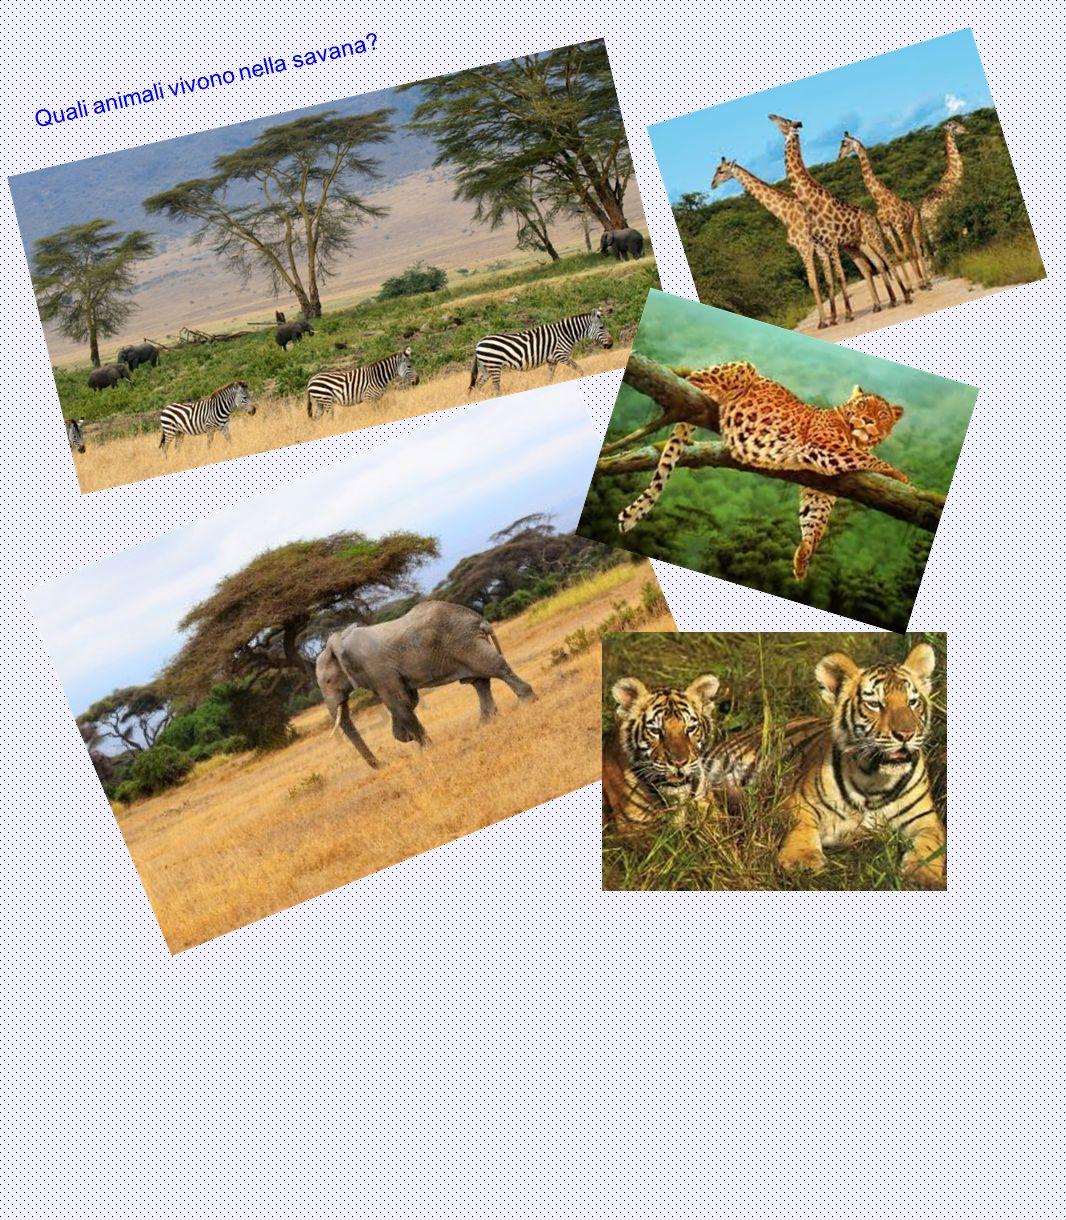 Quali animali vivono nella savana